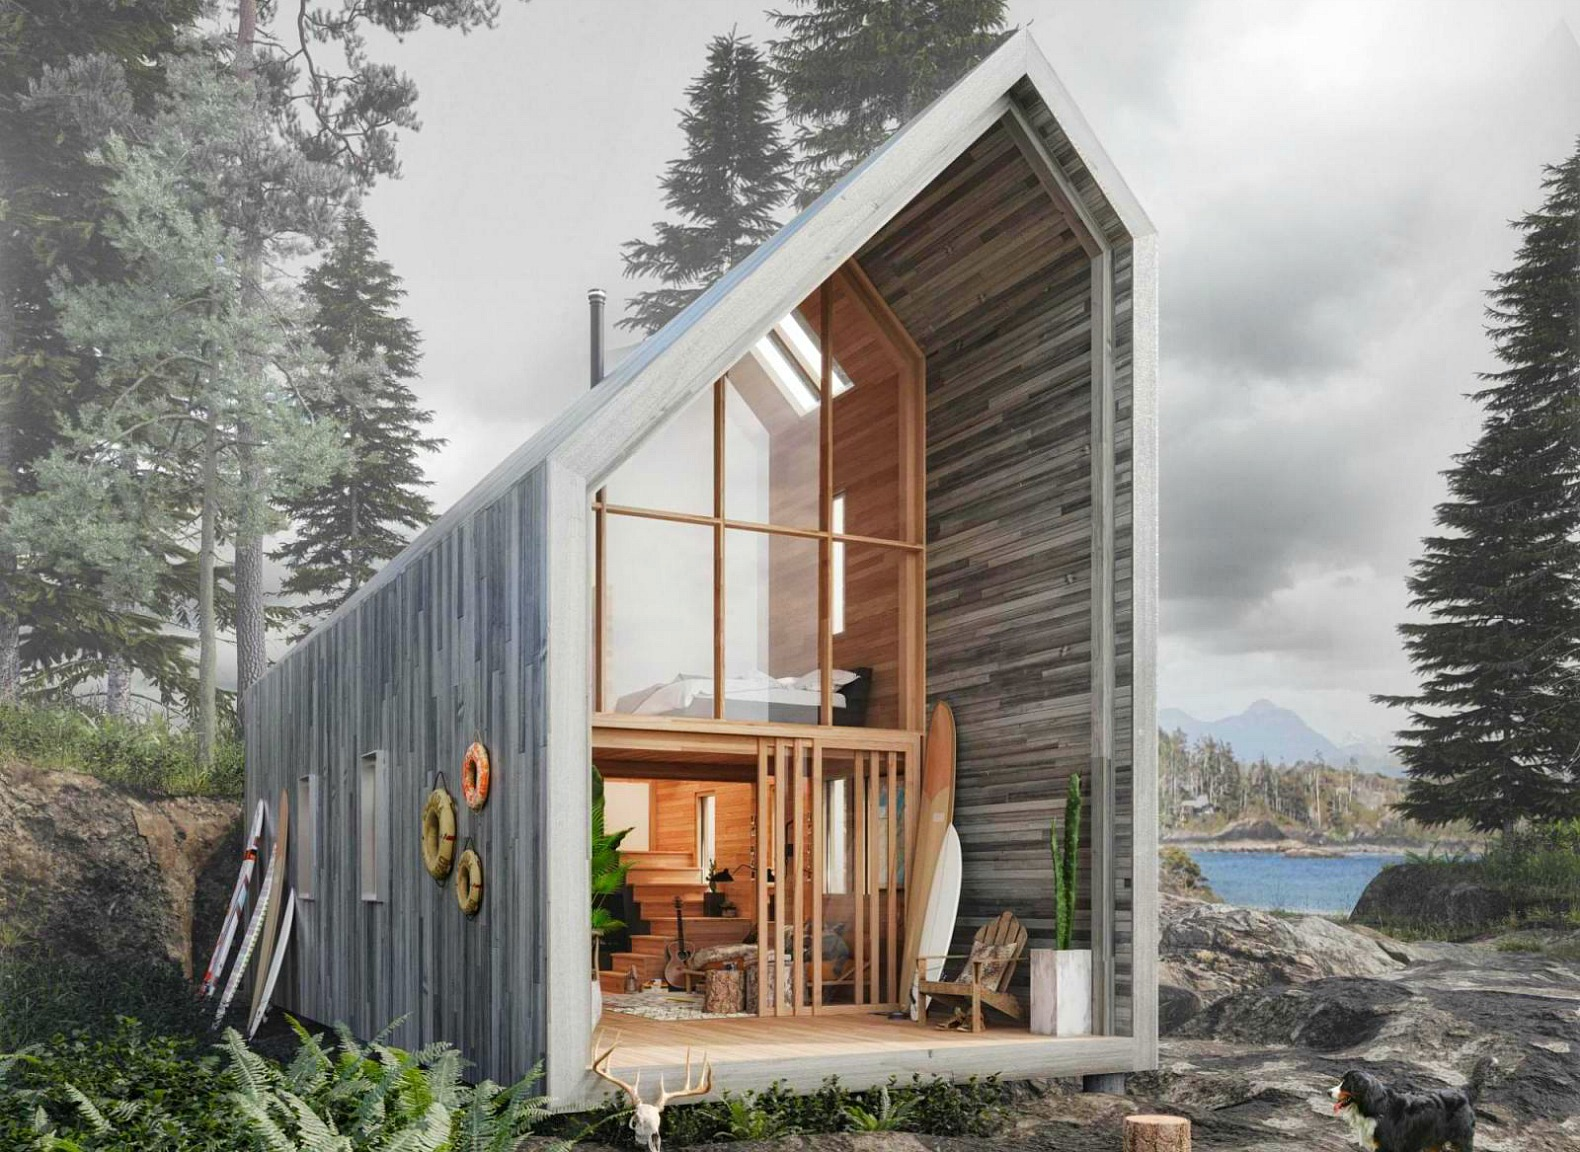 Prefab 'Surf Shack' offers nature getaway, flatpack-style